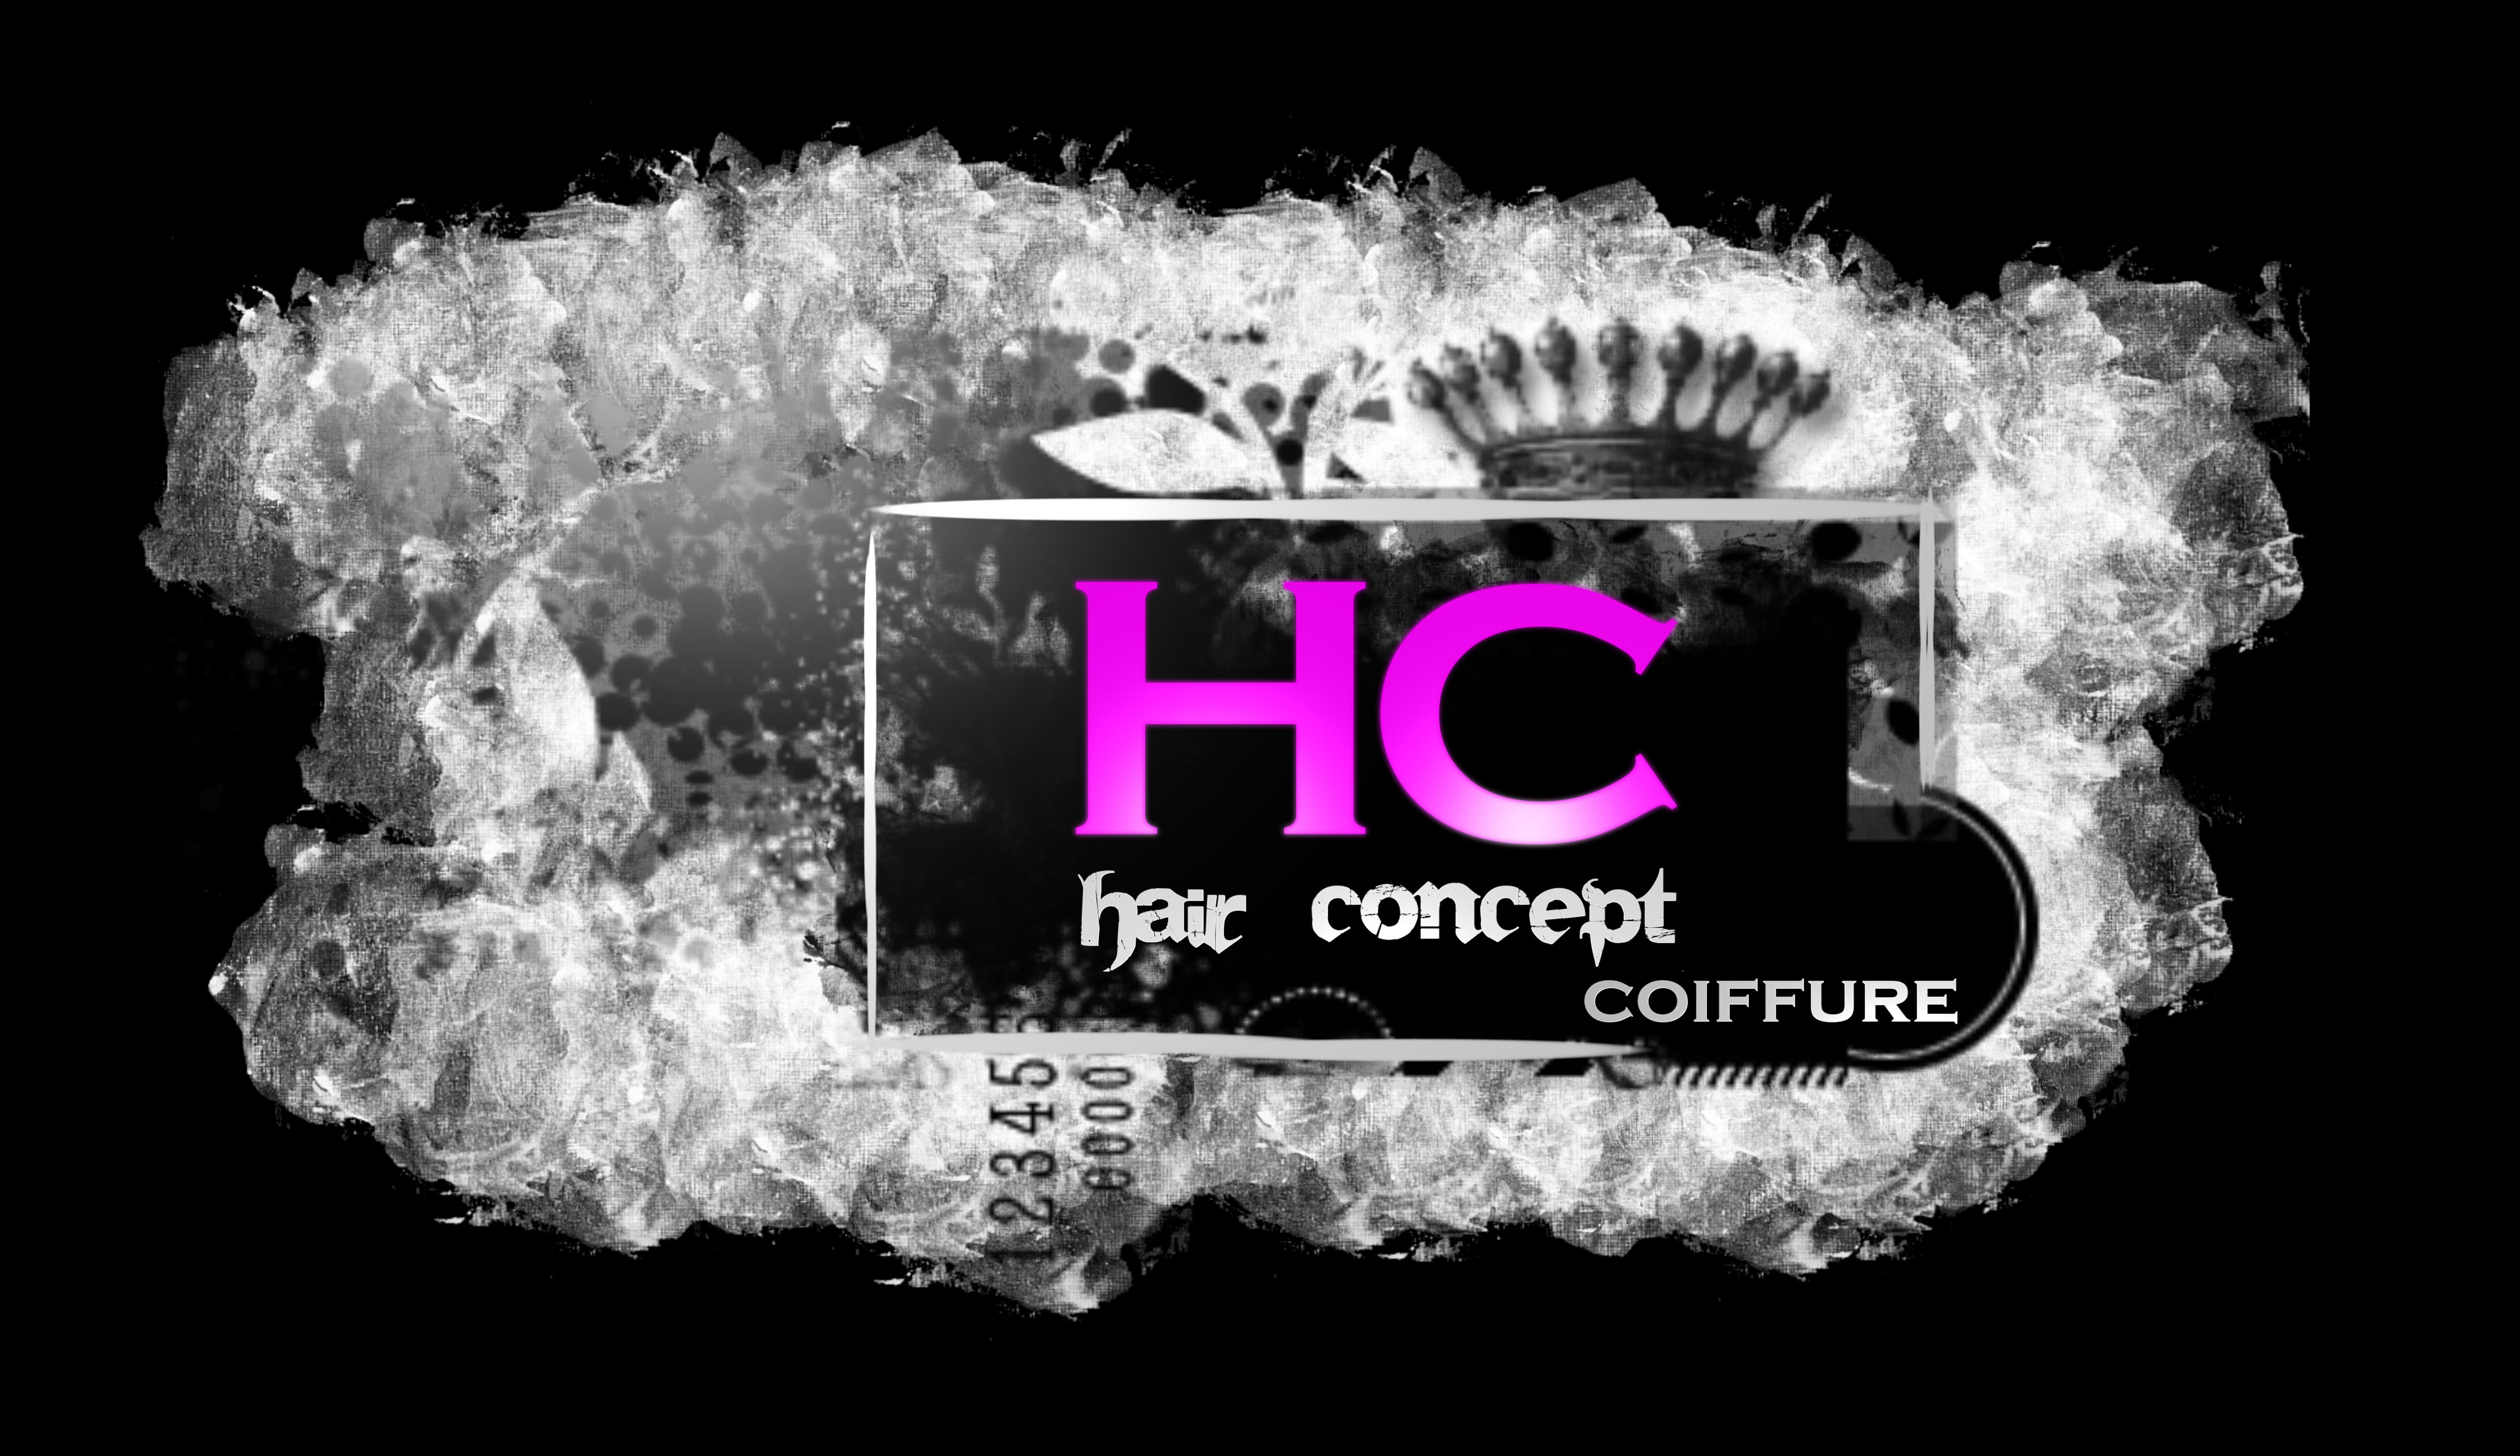 Hair Concept Coiffure